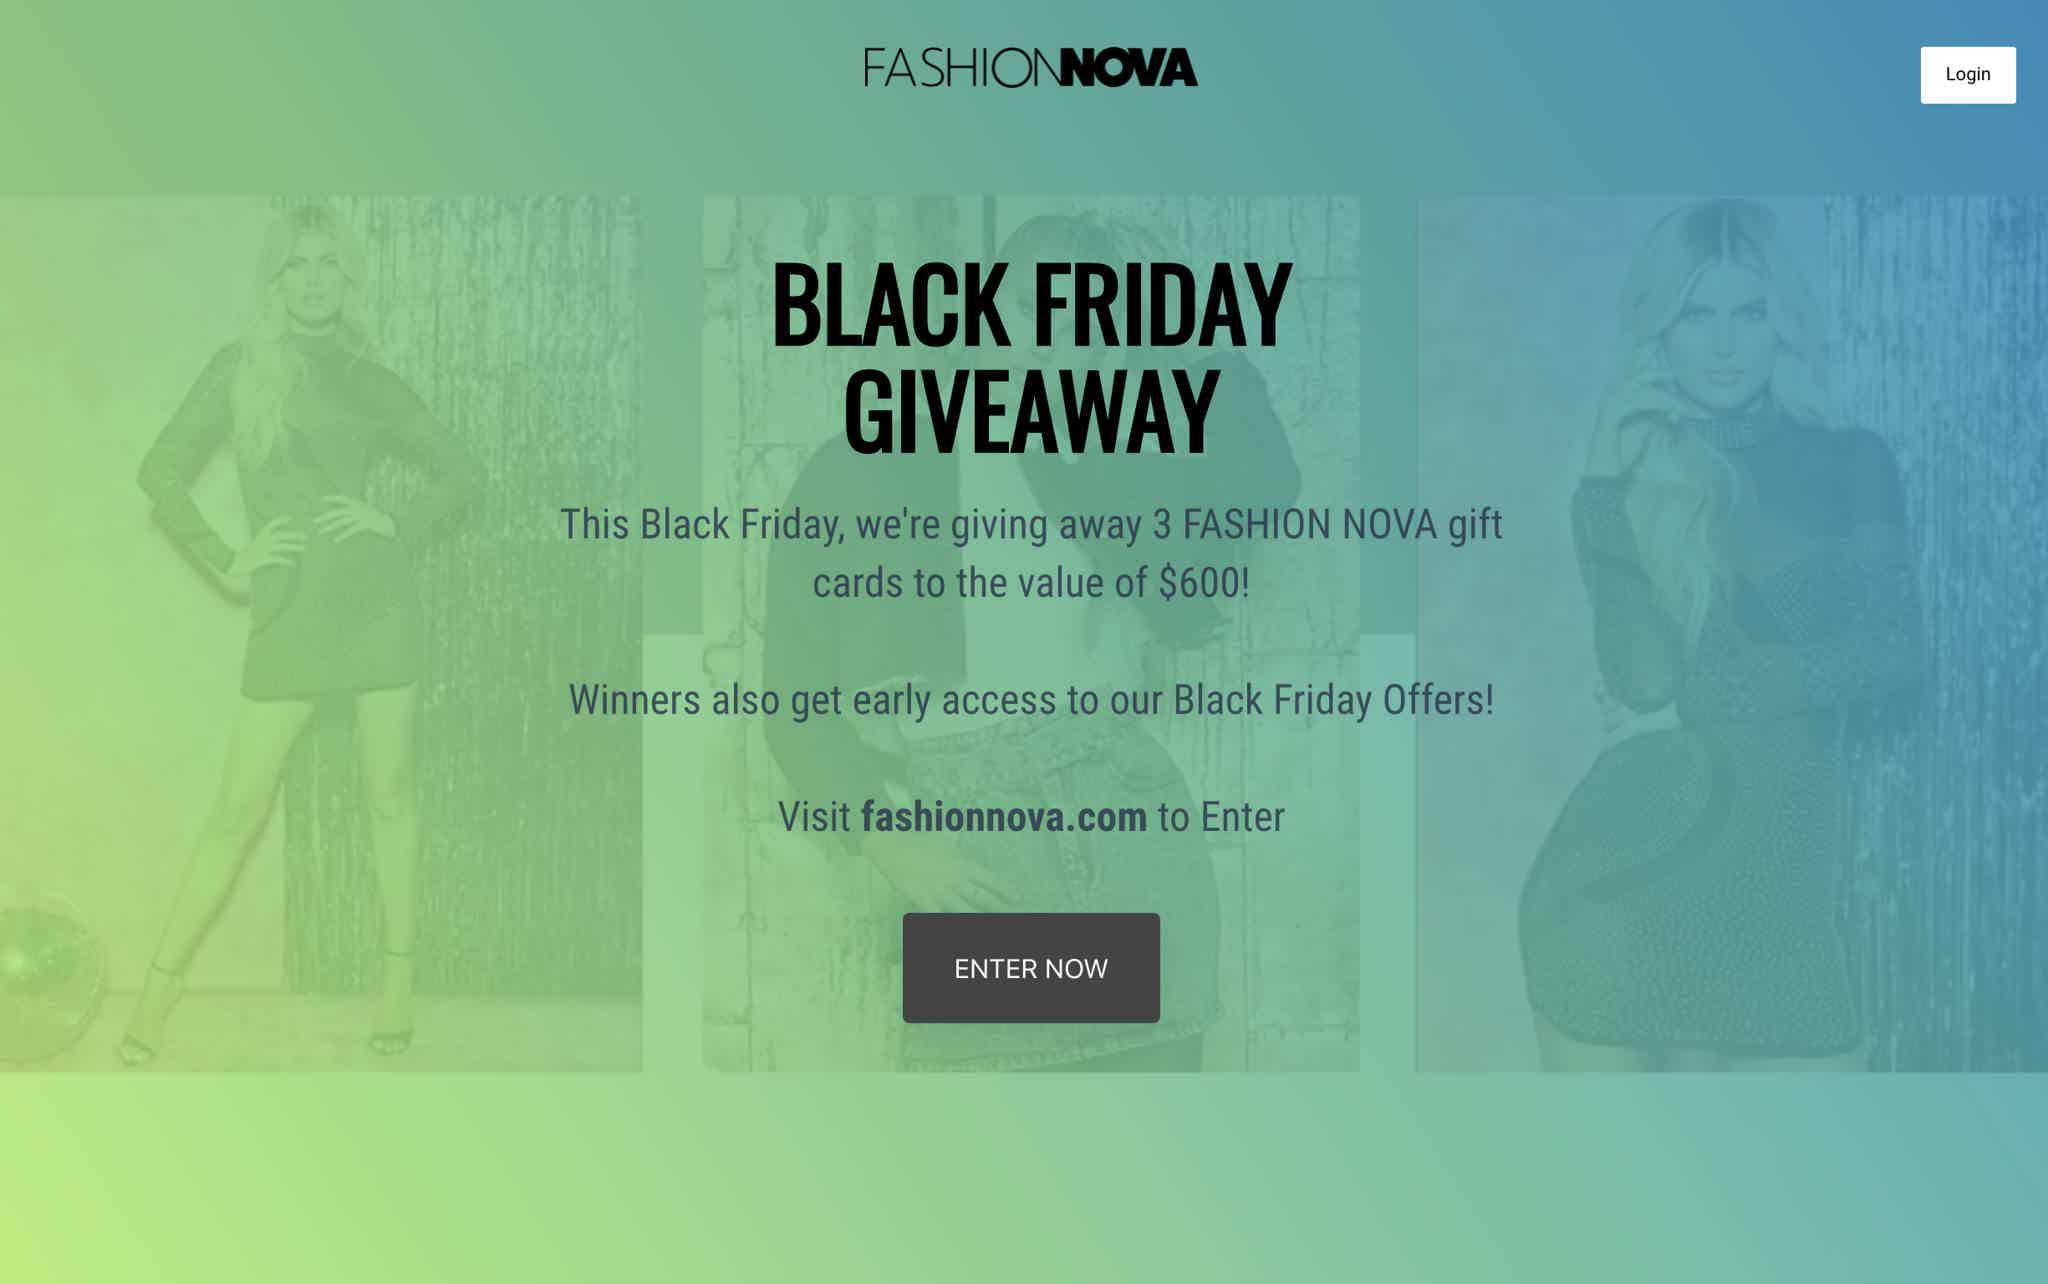 Fashion Nova Black Friday Giveaway